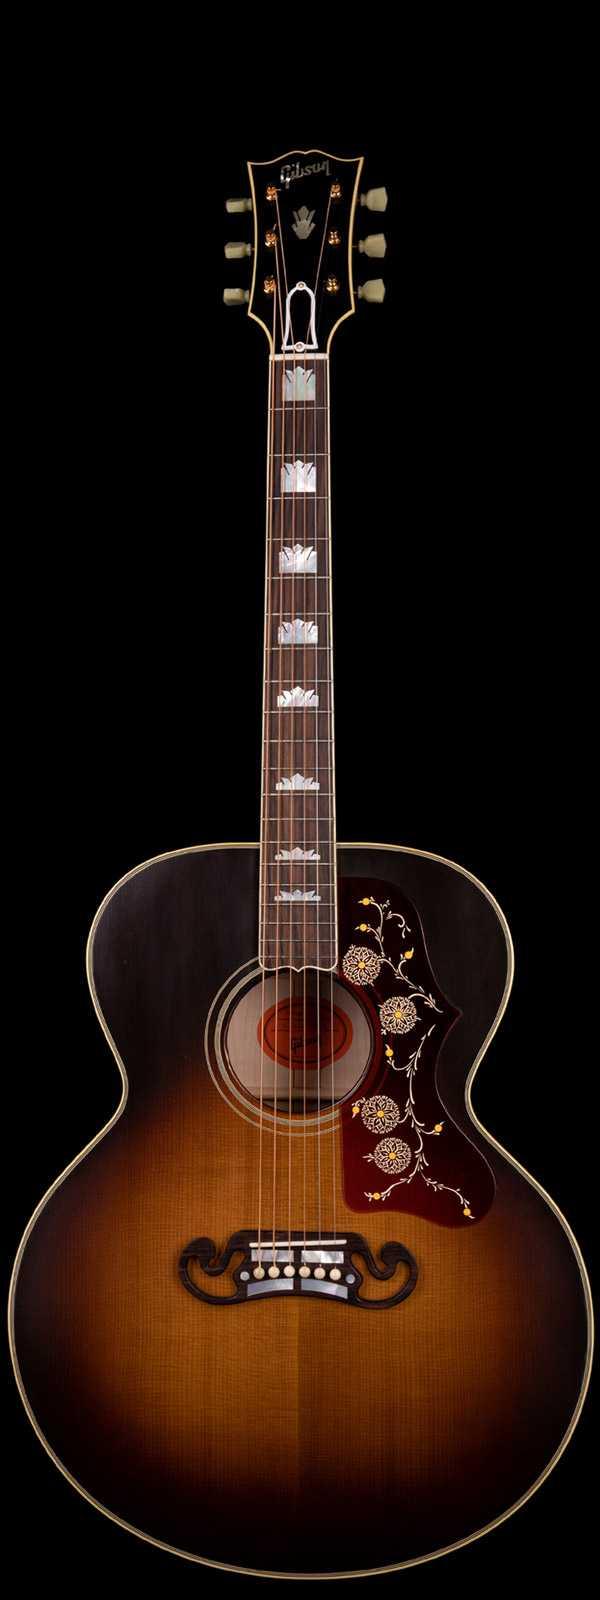 Gibson Custom Shop 1957 SJ-200 Thermally Aged Sitka Spruce Top Vintage Sunburst VOS